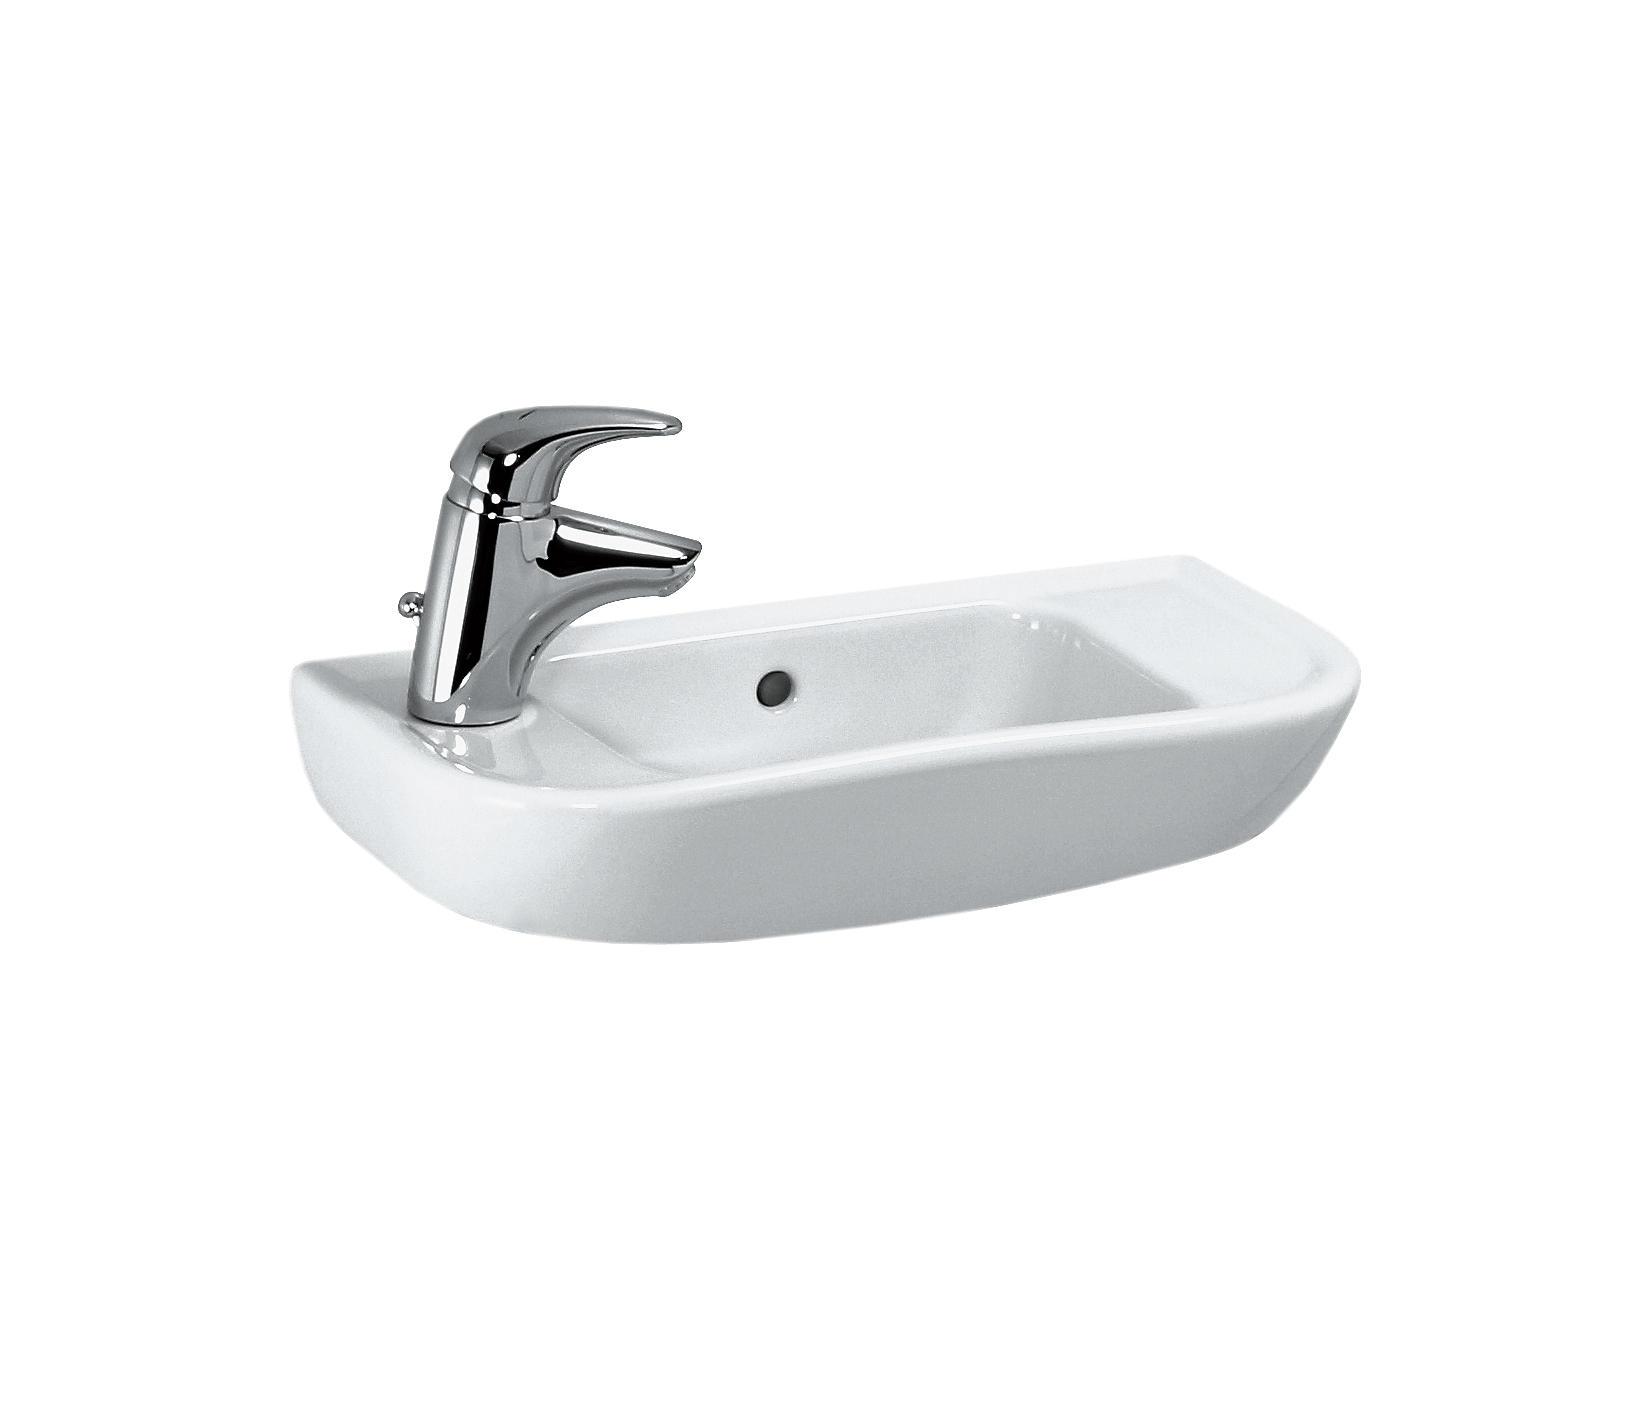 laufen pro b washbasin wash basins from laufen architonic. Black Bedroom Furniture Sets. Home Design Ideas